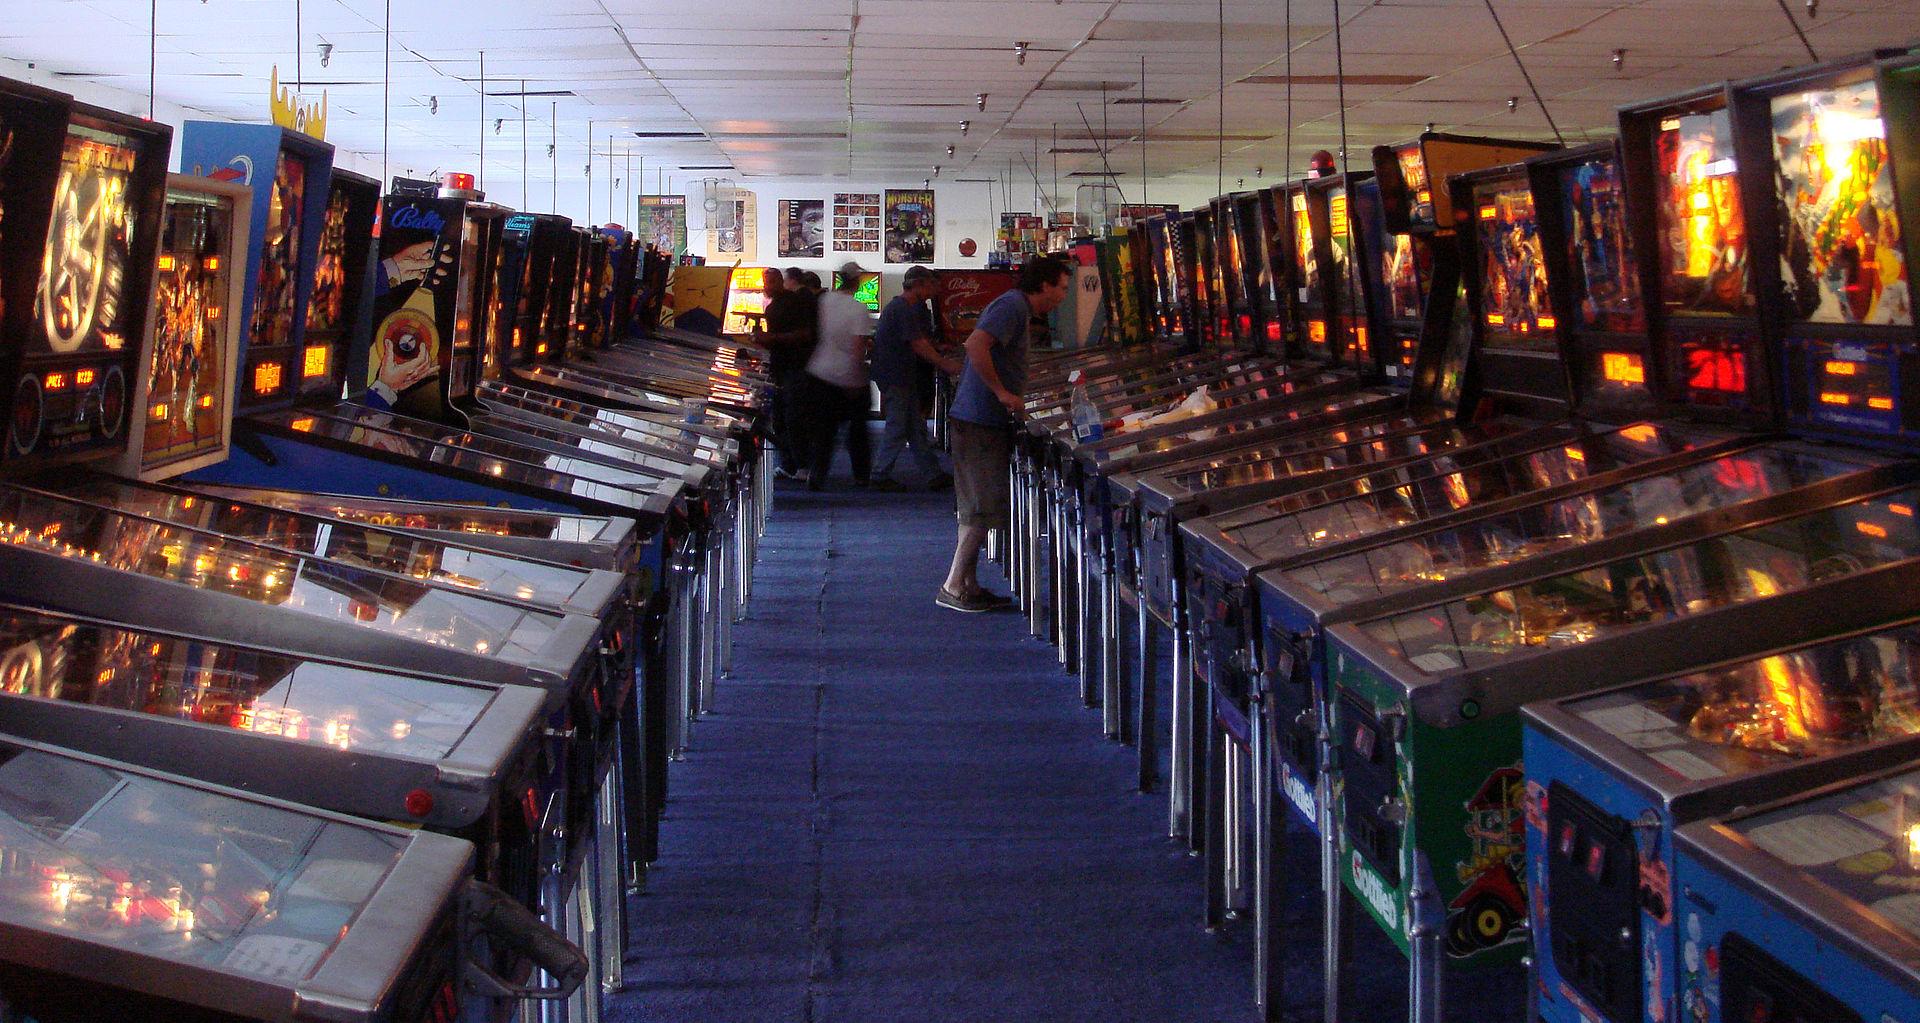 A row of pinball machines at the Pinball Hall of Fame in Las Vegas, Nevada. Bobak Ha'Eri - Own work